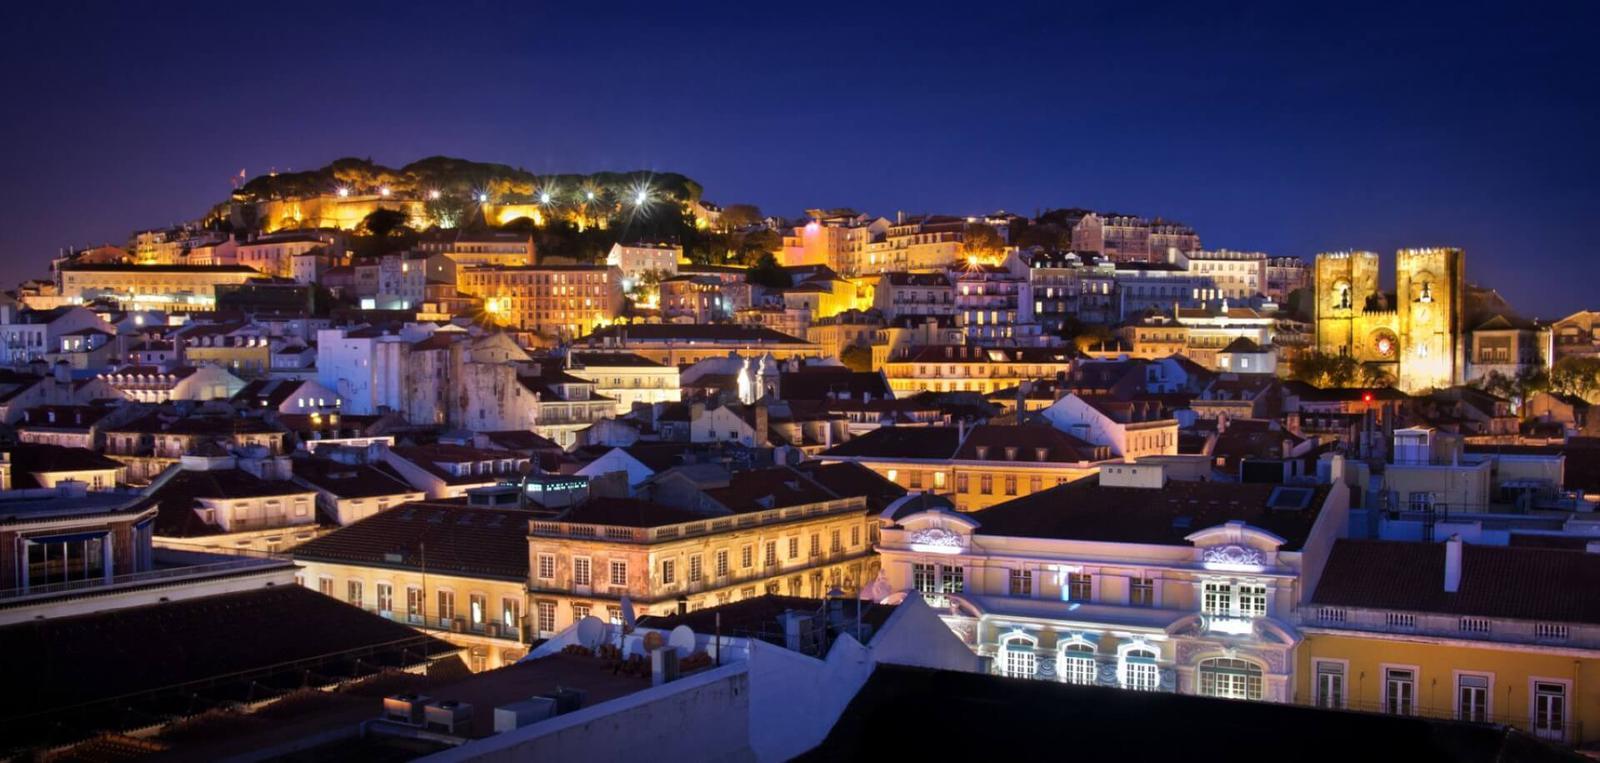 Noche vieja Lisboa